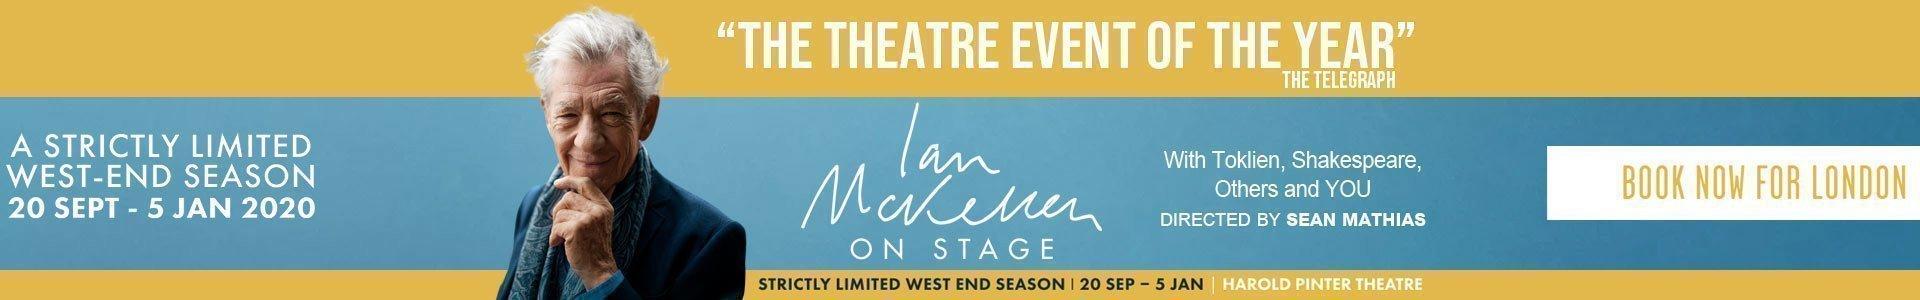 Ian McKellen on Stage: Tolkien, Shakespeare and You! Tickets